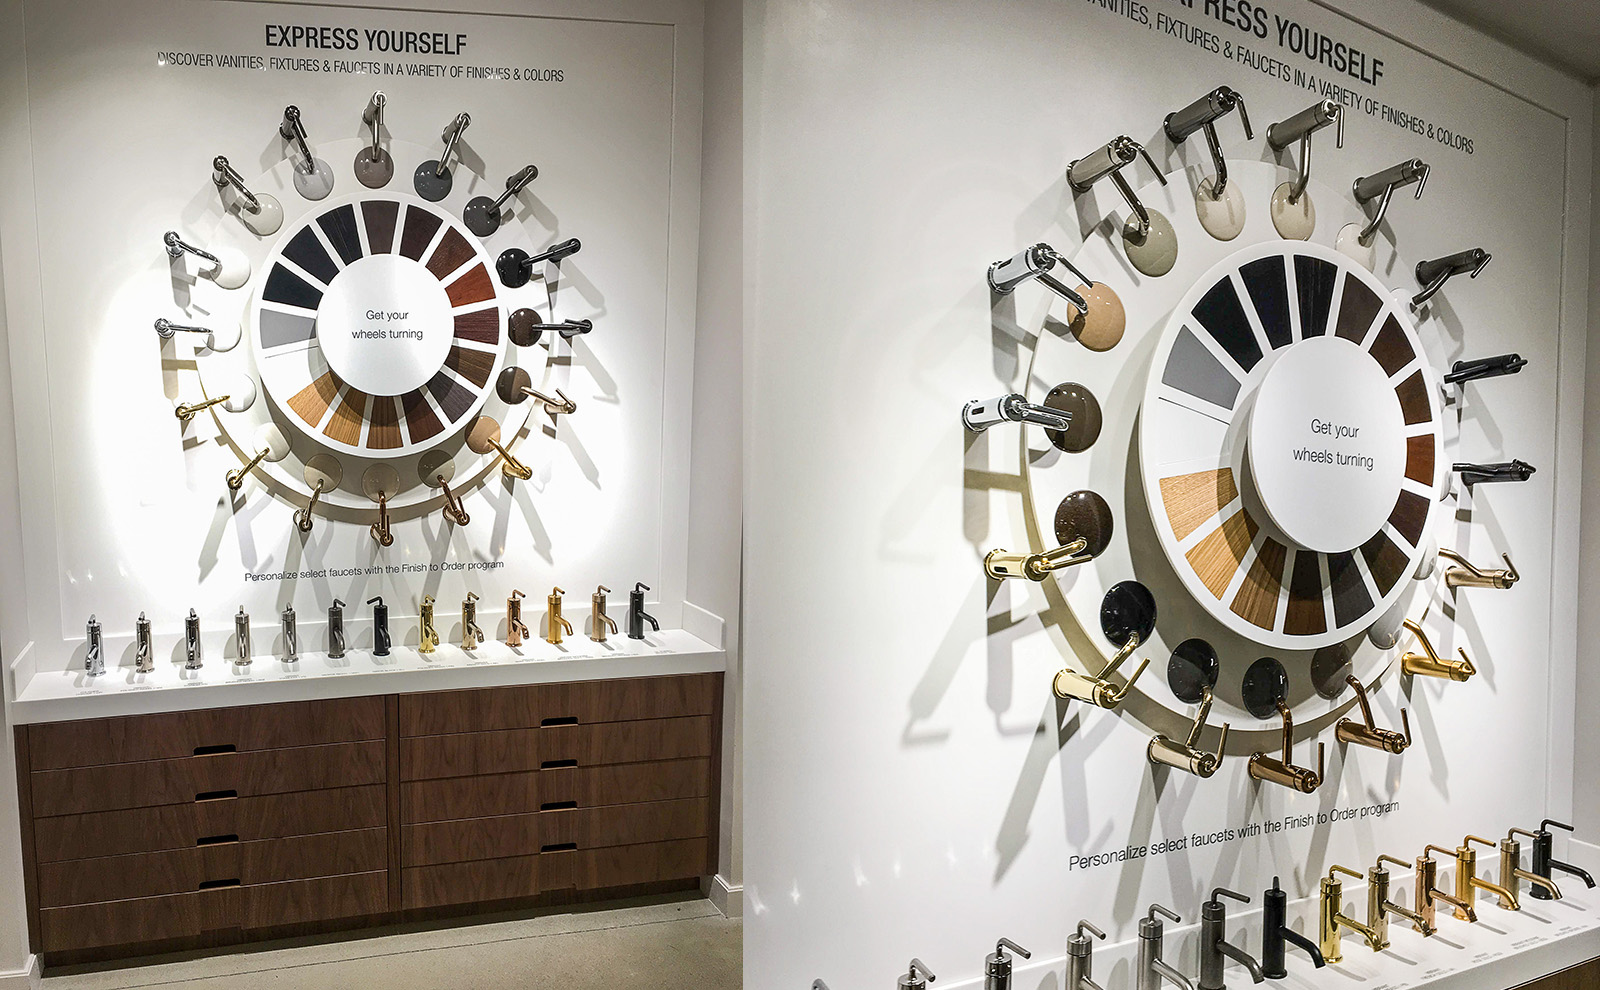 The final spinner wheel installed in the Kohler NYC showroom